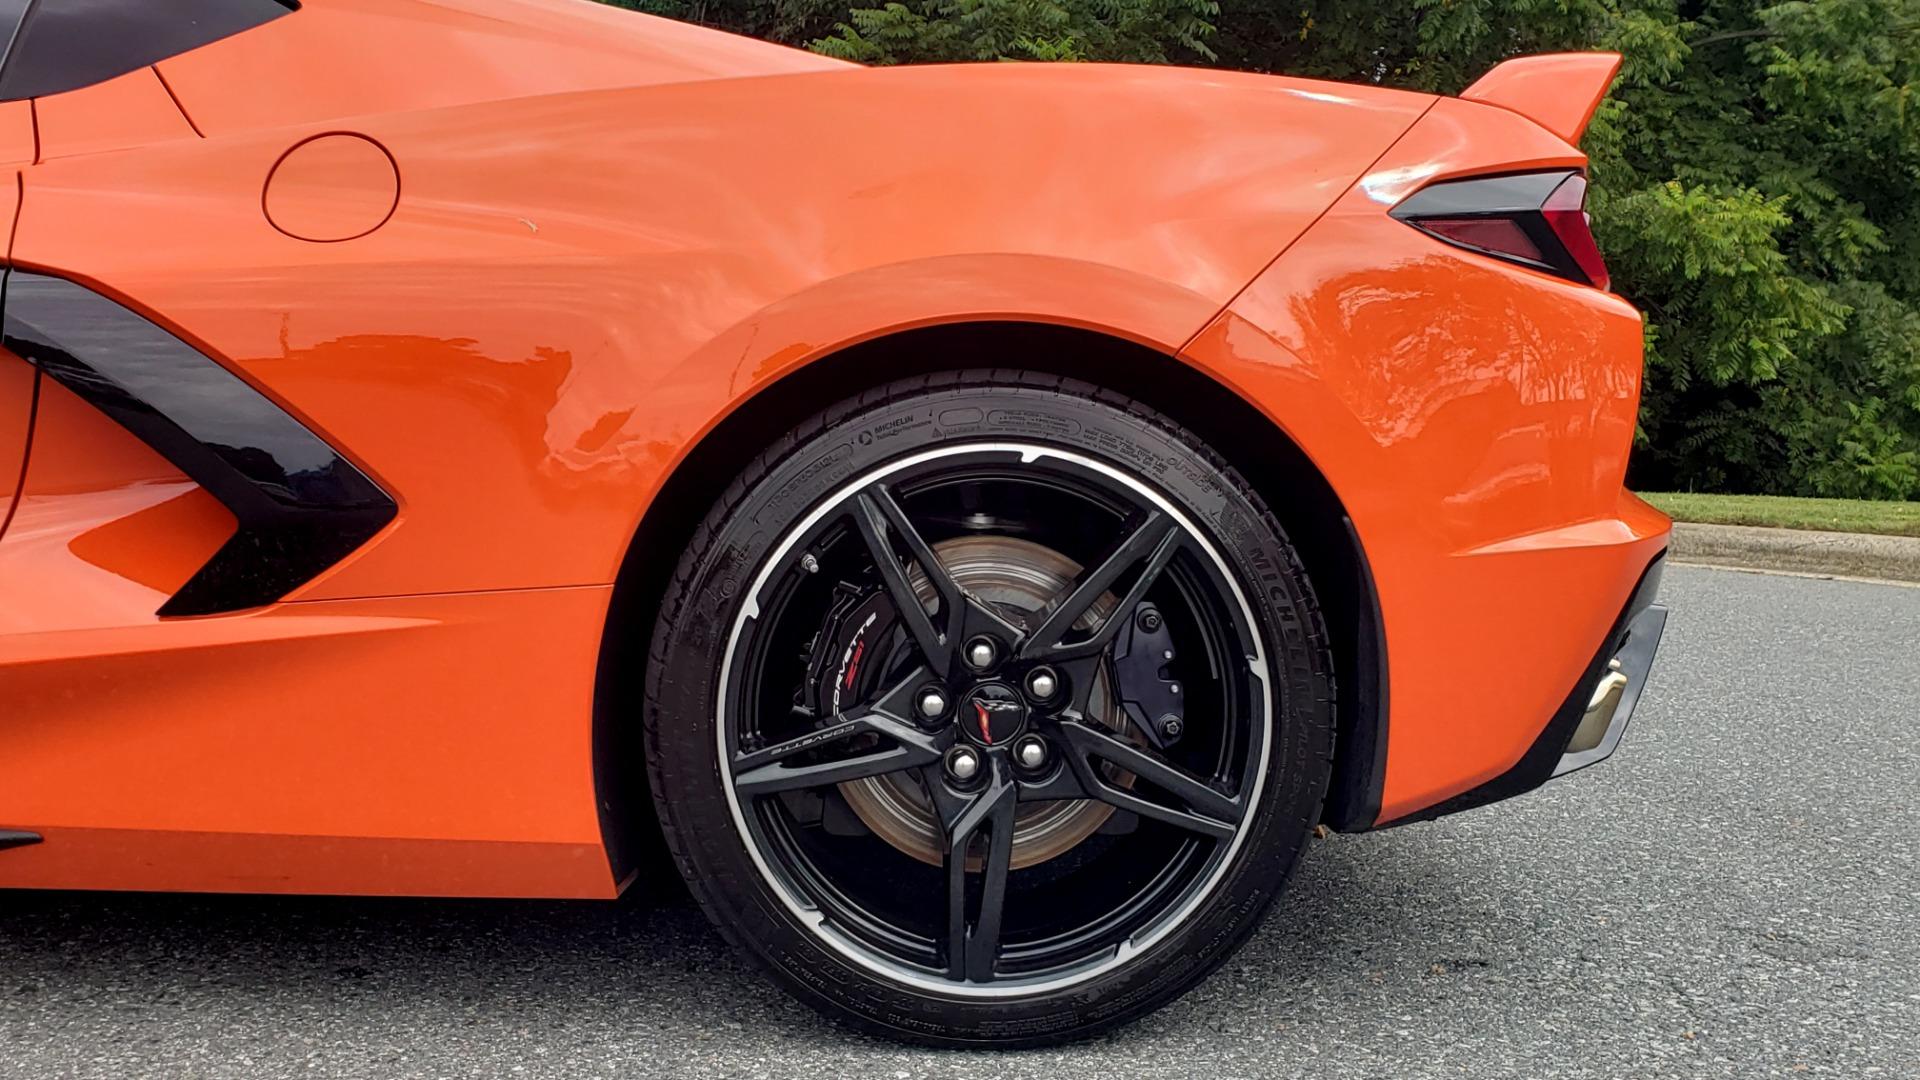 Used 2020 Chevrolet CORVETTE C8 STINGRAY 2LT / 6.2L V8 / 8-SPD AUTO / NAV / BOSE / REARVIEW / DATA RECOR for sale Sold at Formula Imports in Charlotte NC 28227 84